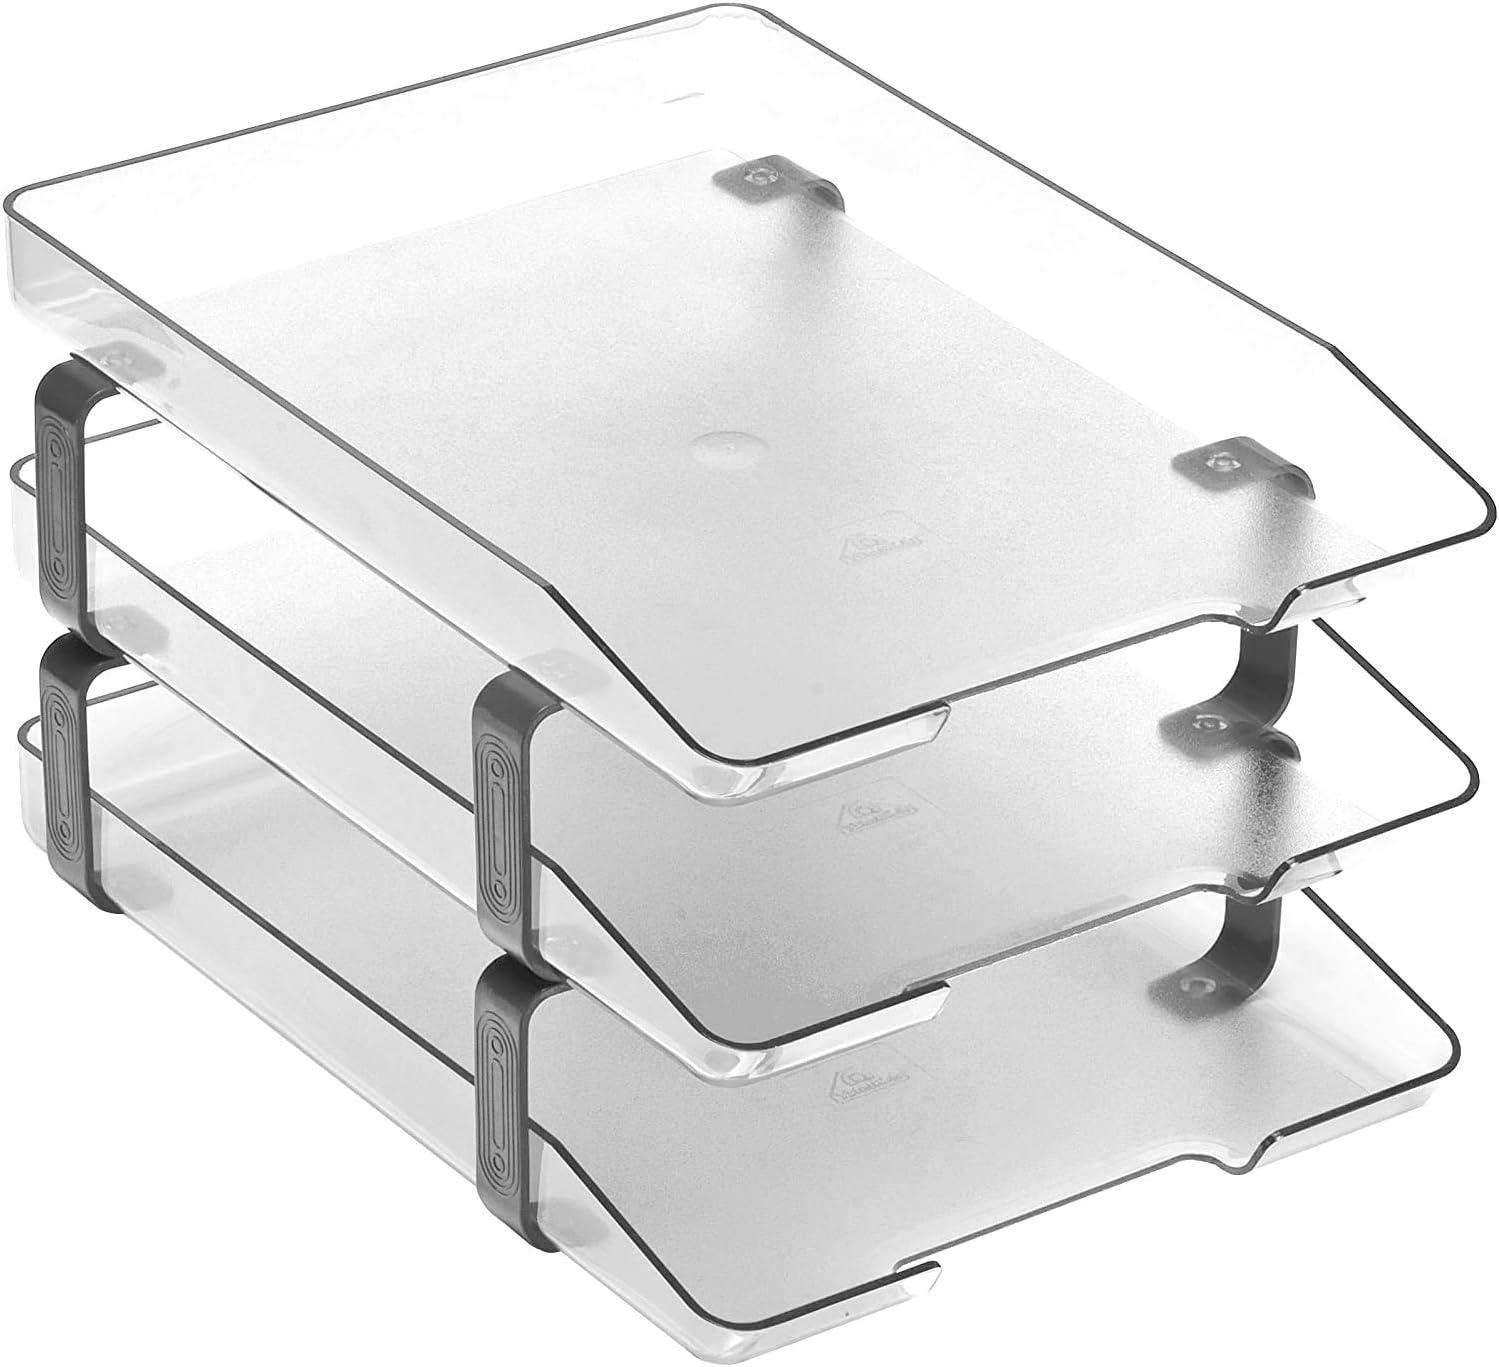 Acrimet Traditional Letter Tray 55% OFF 3 Front Load Deskto Sales for sale Tier Plastic